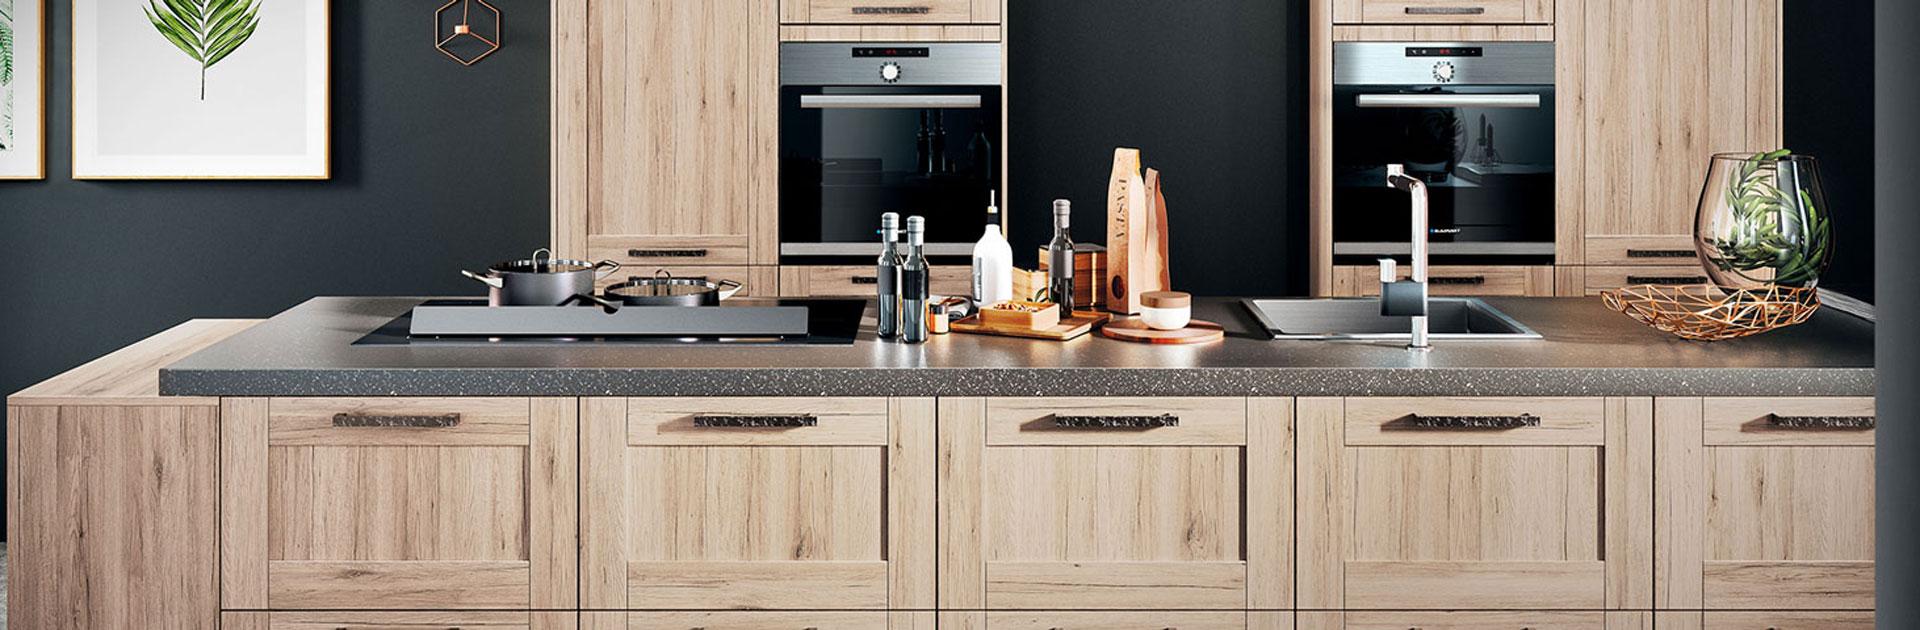 Houten ECOOK keuken | Eigenhuis Keukens